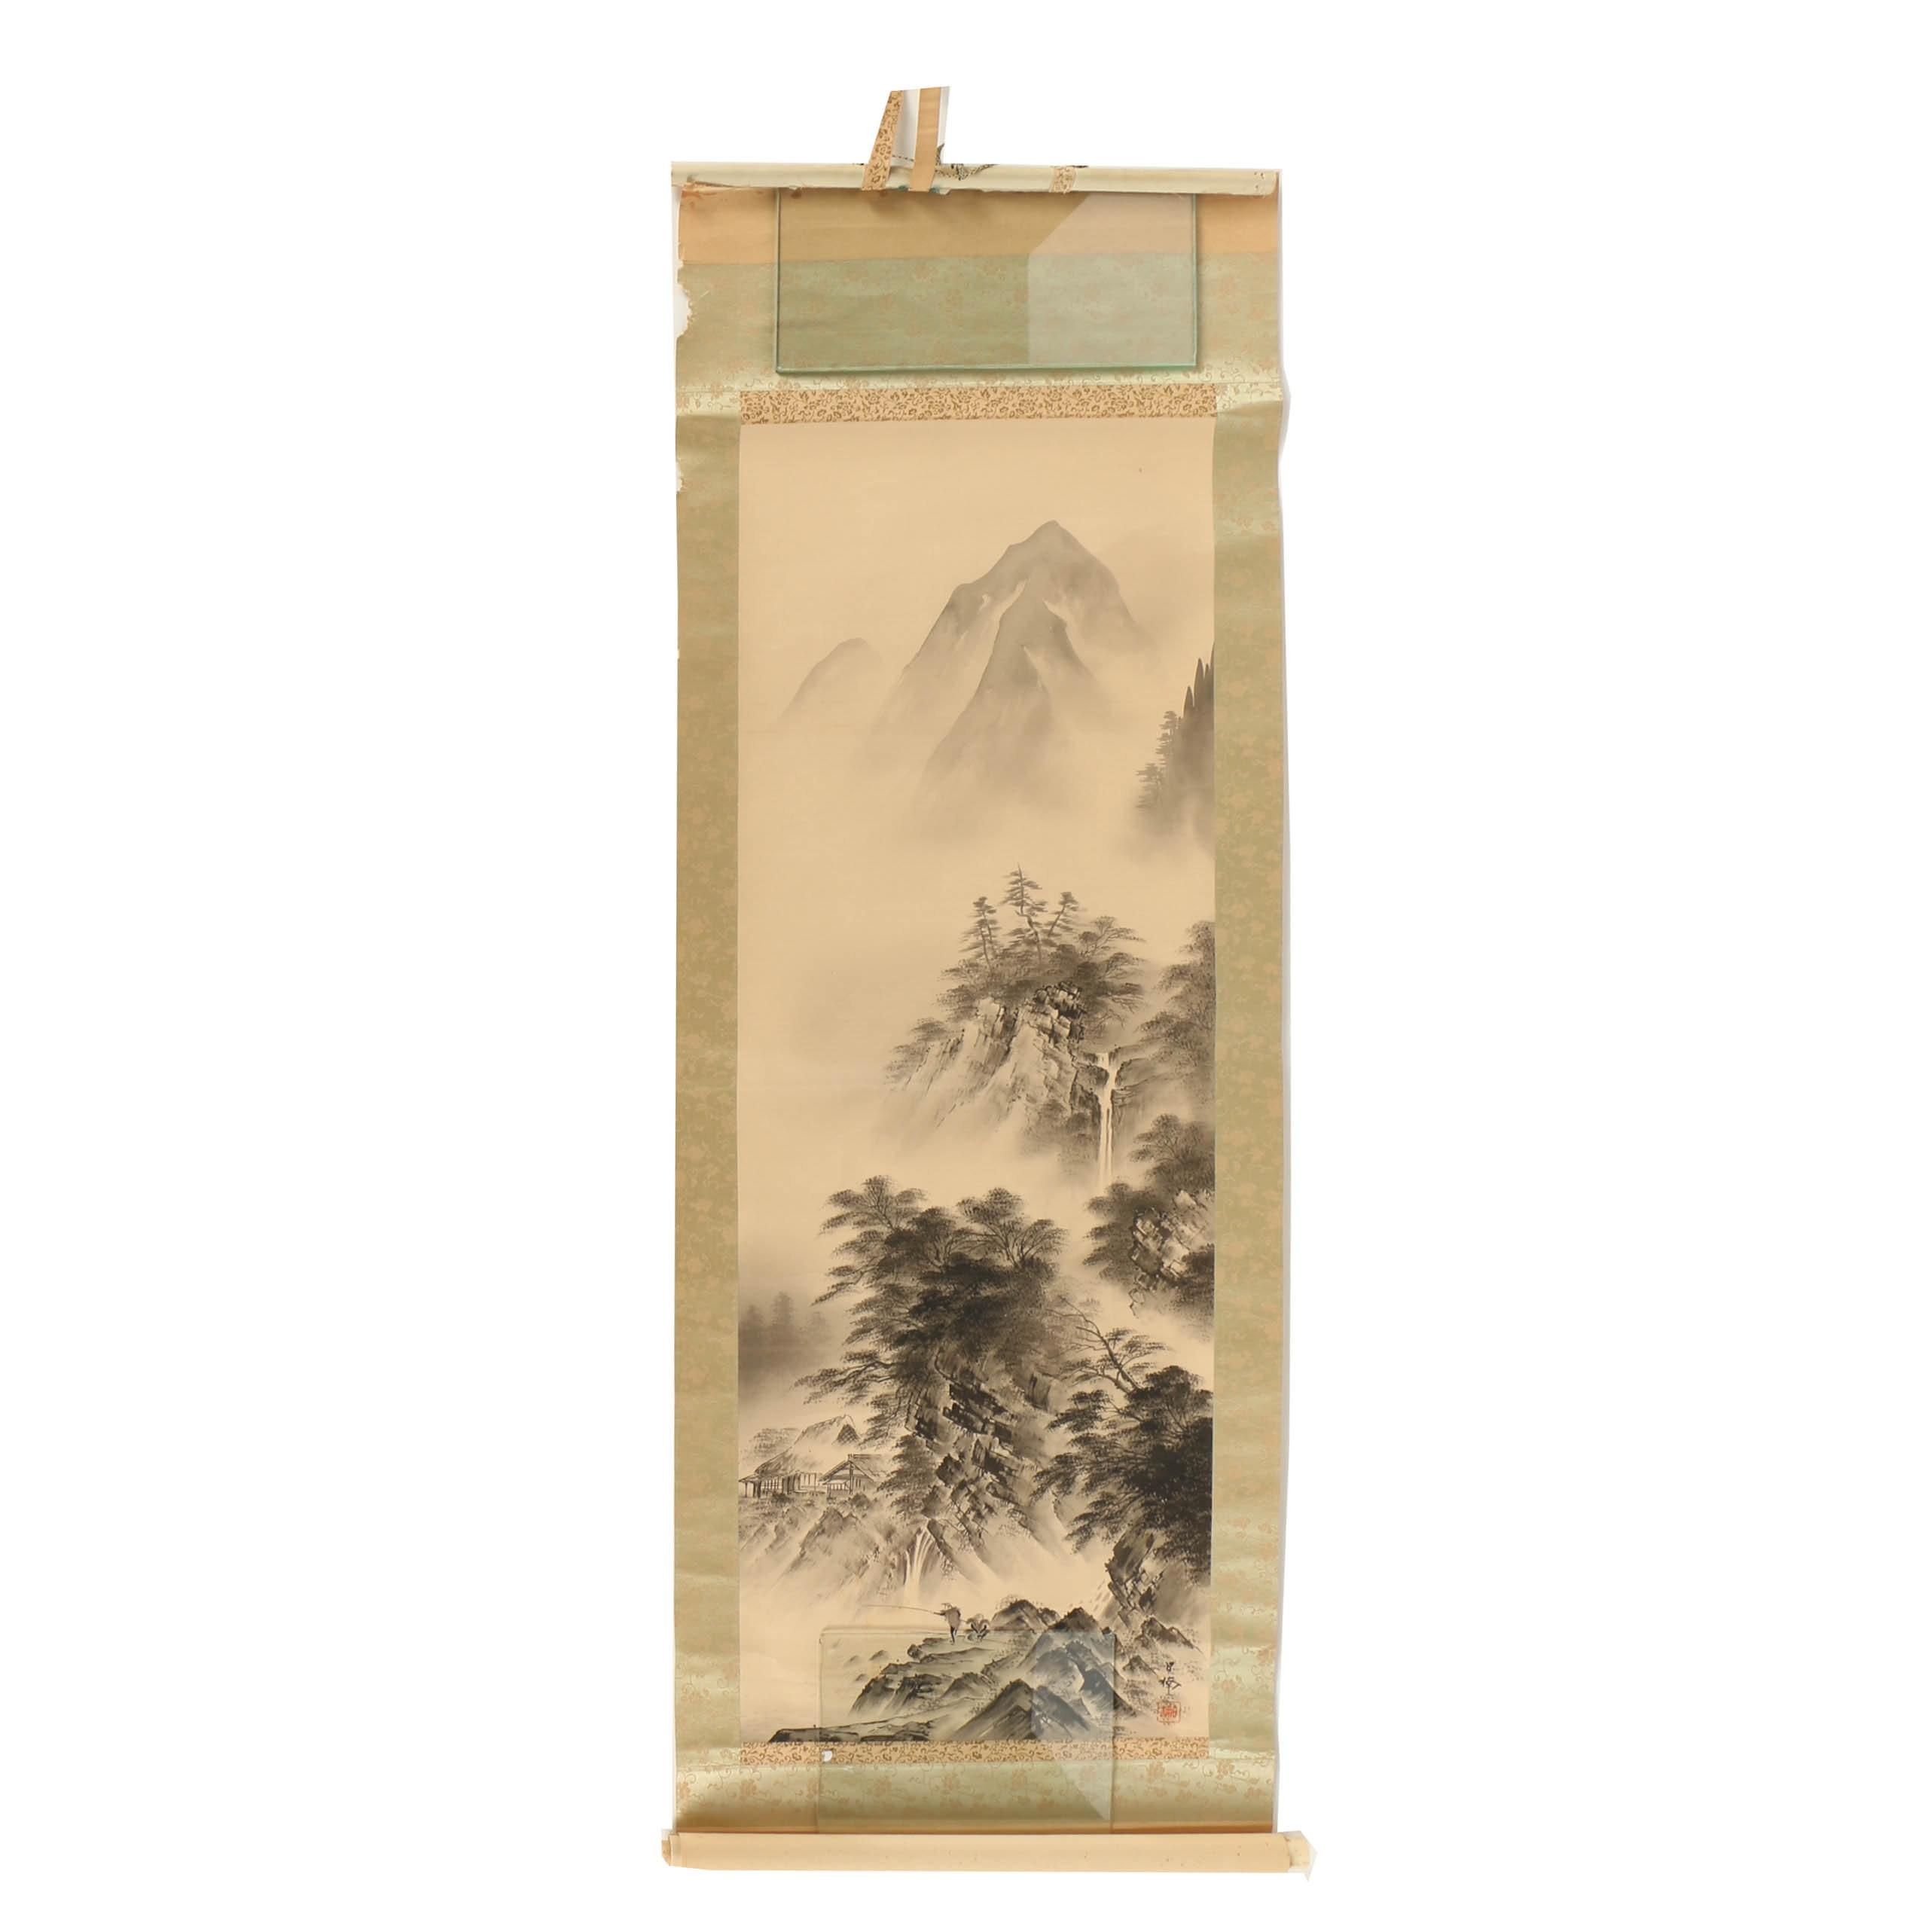 Japanese Ink on Paper Figurative Landscape Hanging Scroll